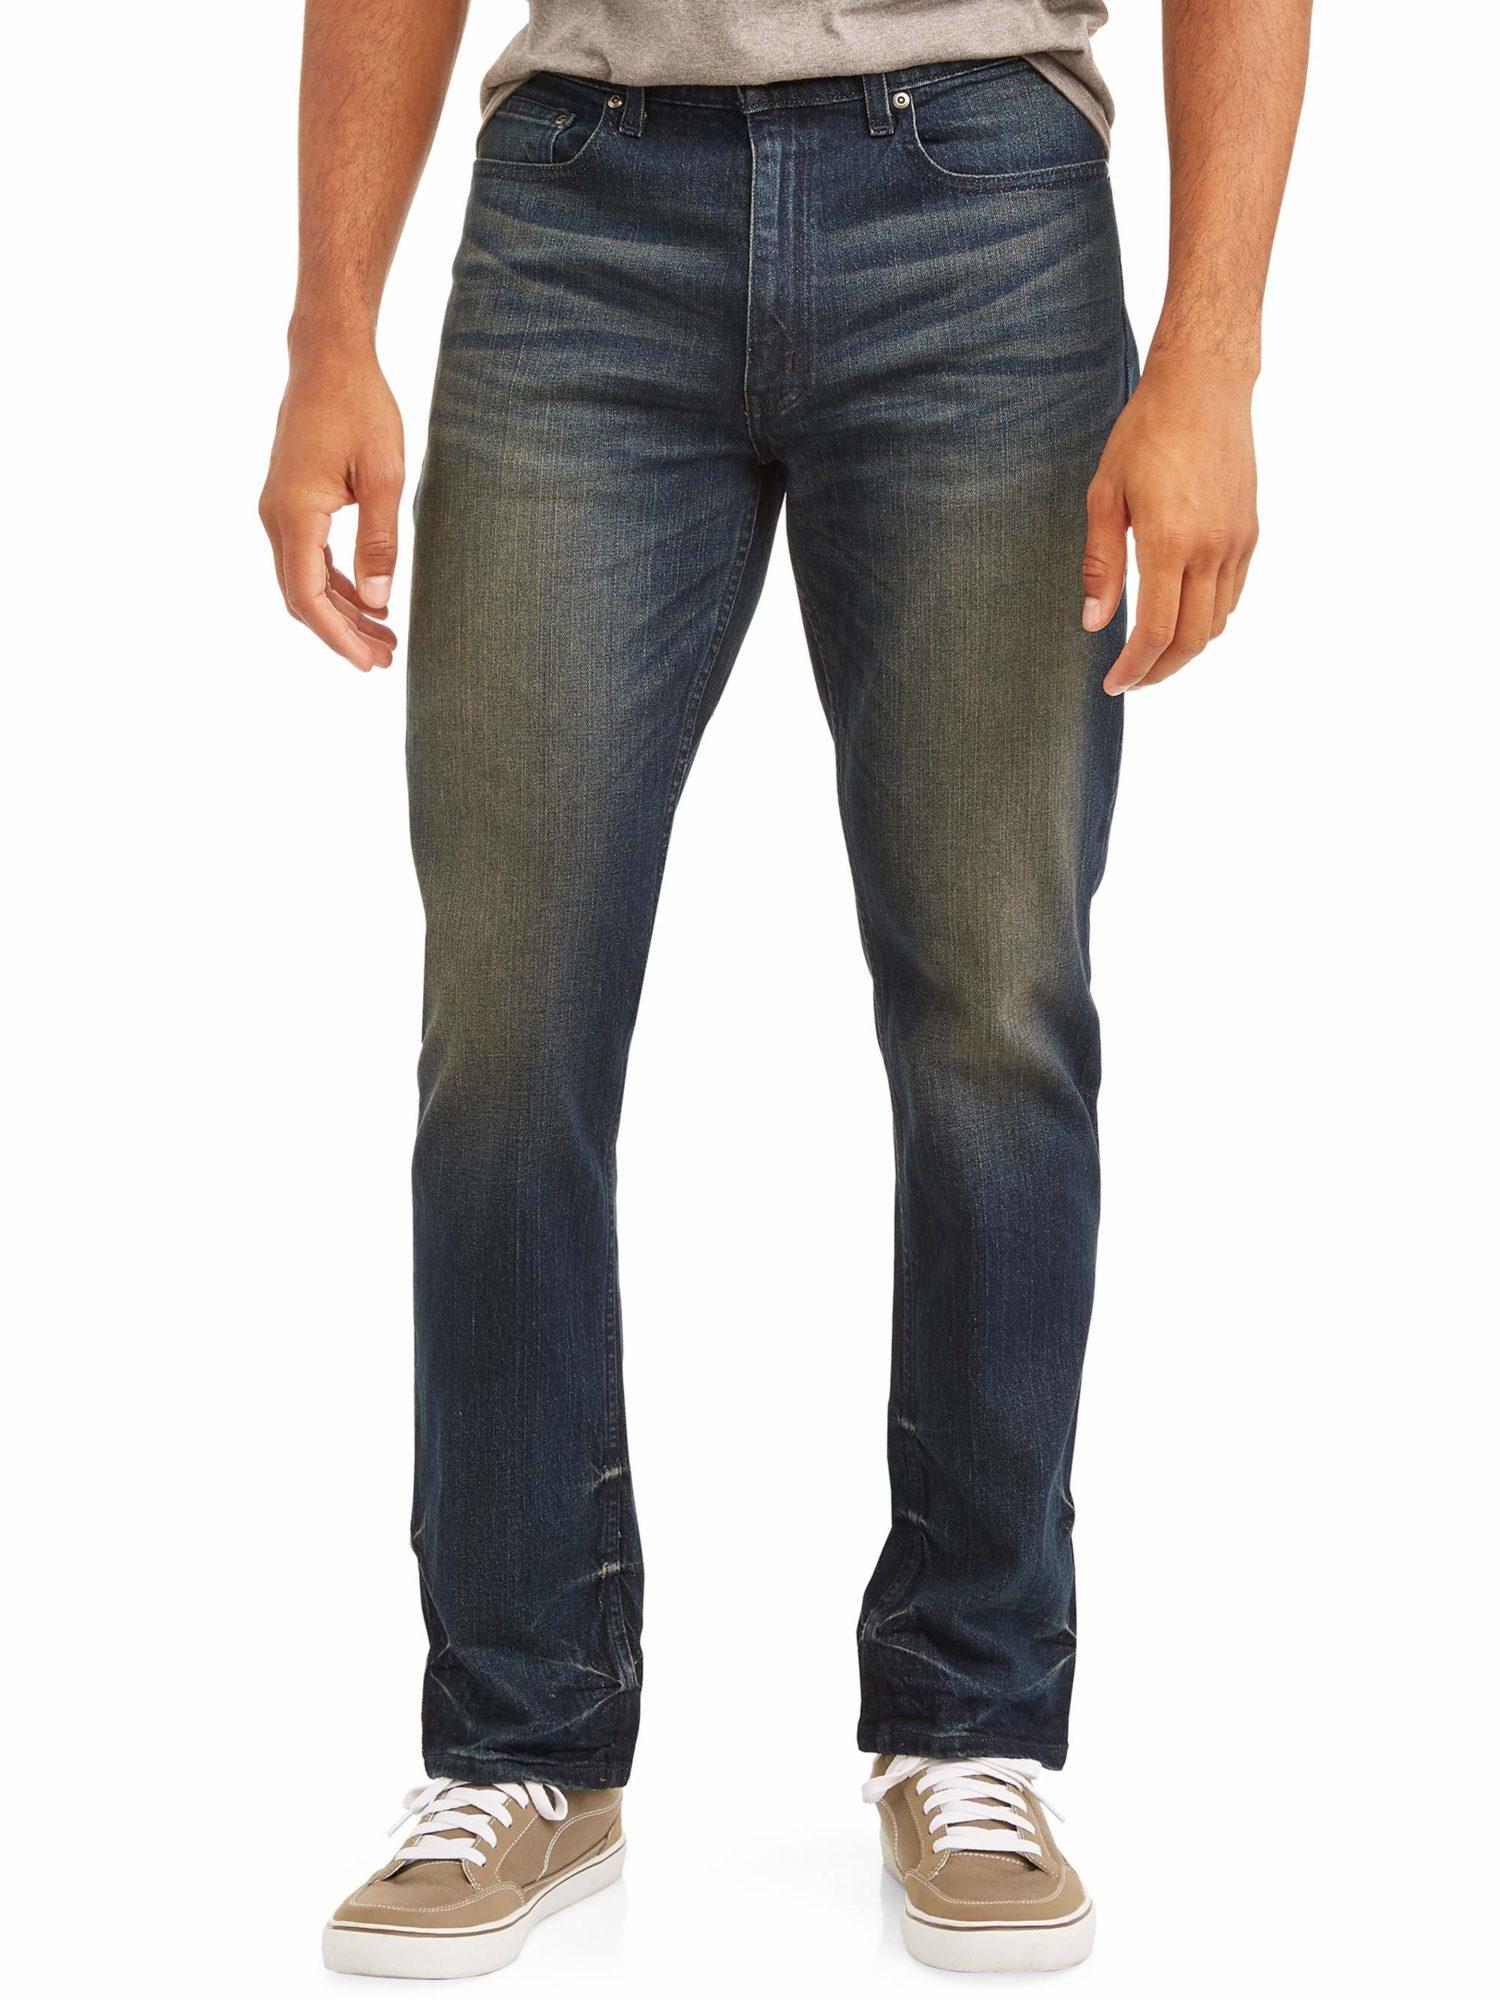 Walmart: George Men's Athletic-Fit Jeans $11